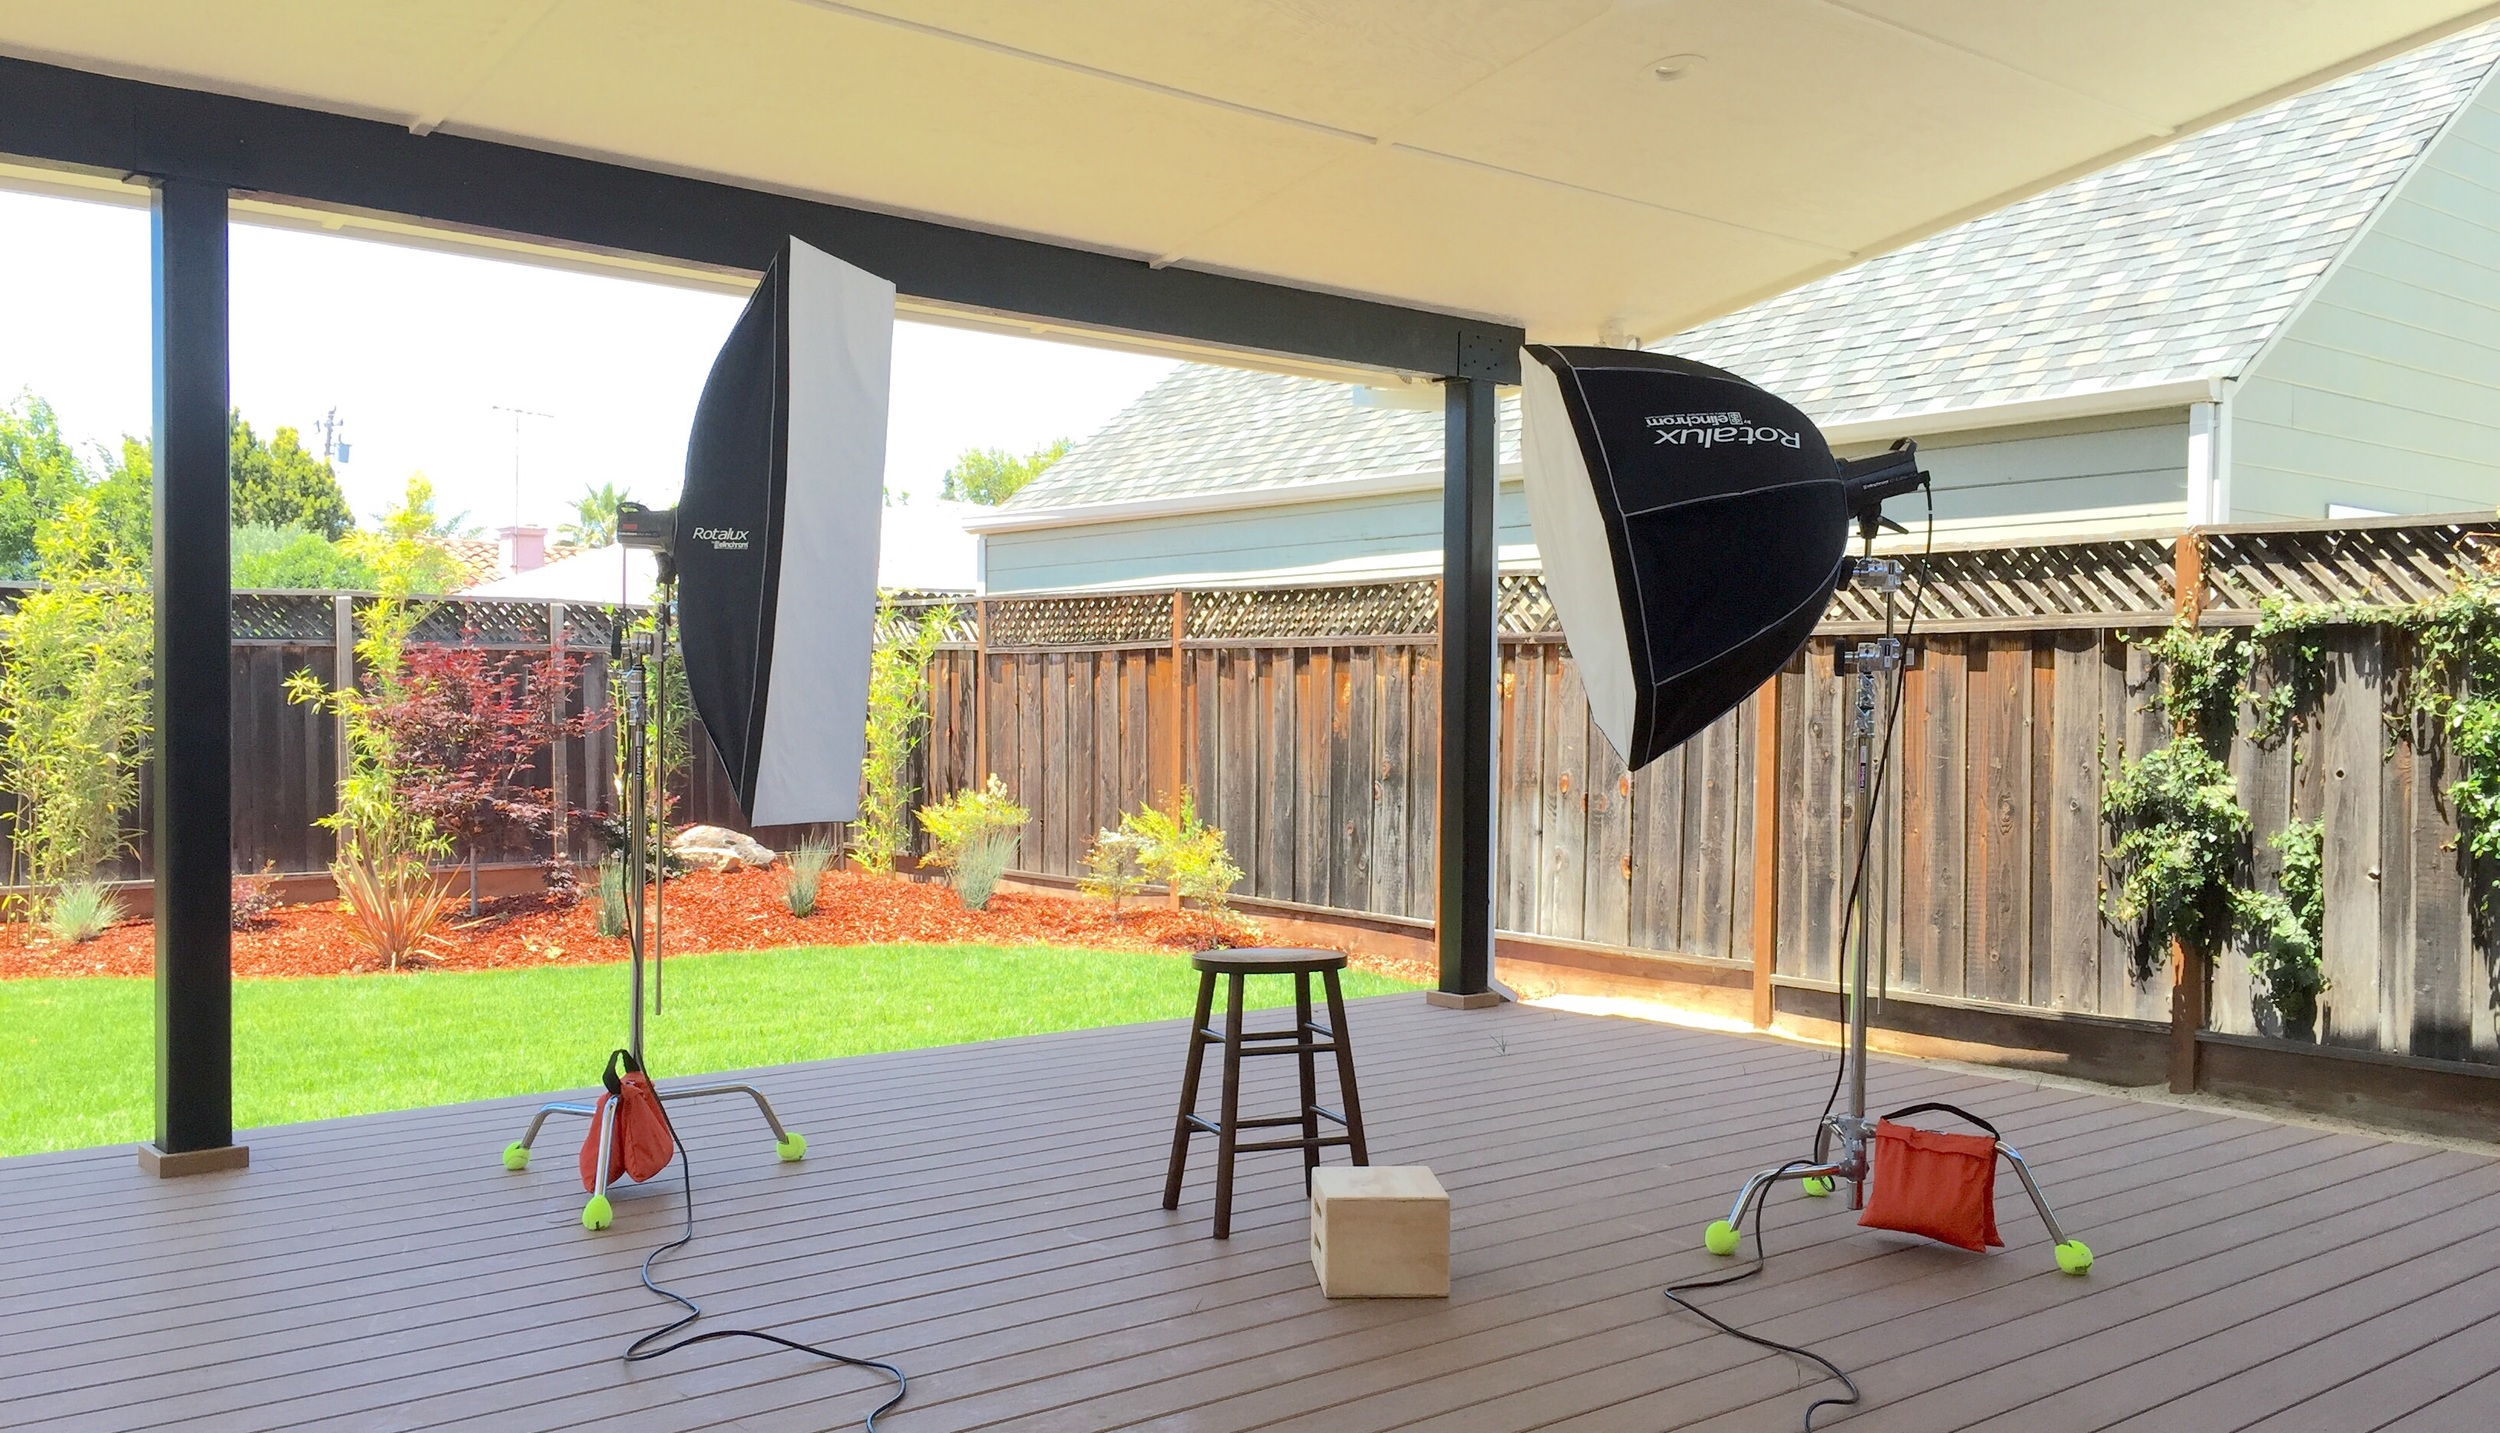 San Jose JapanTown outdoor studio.